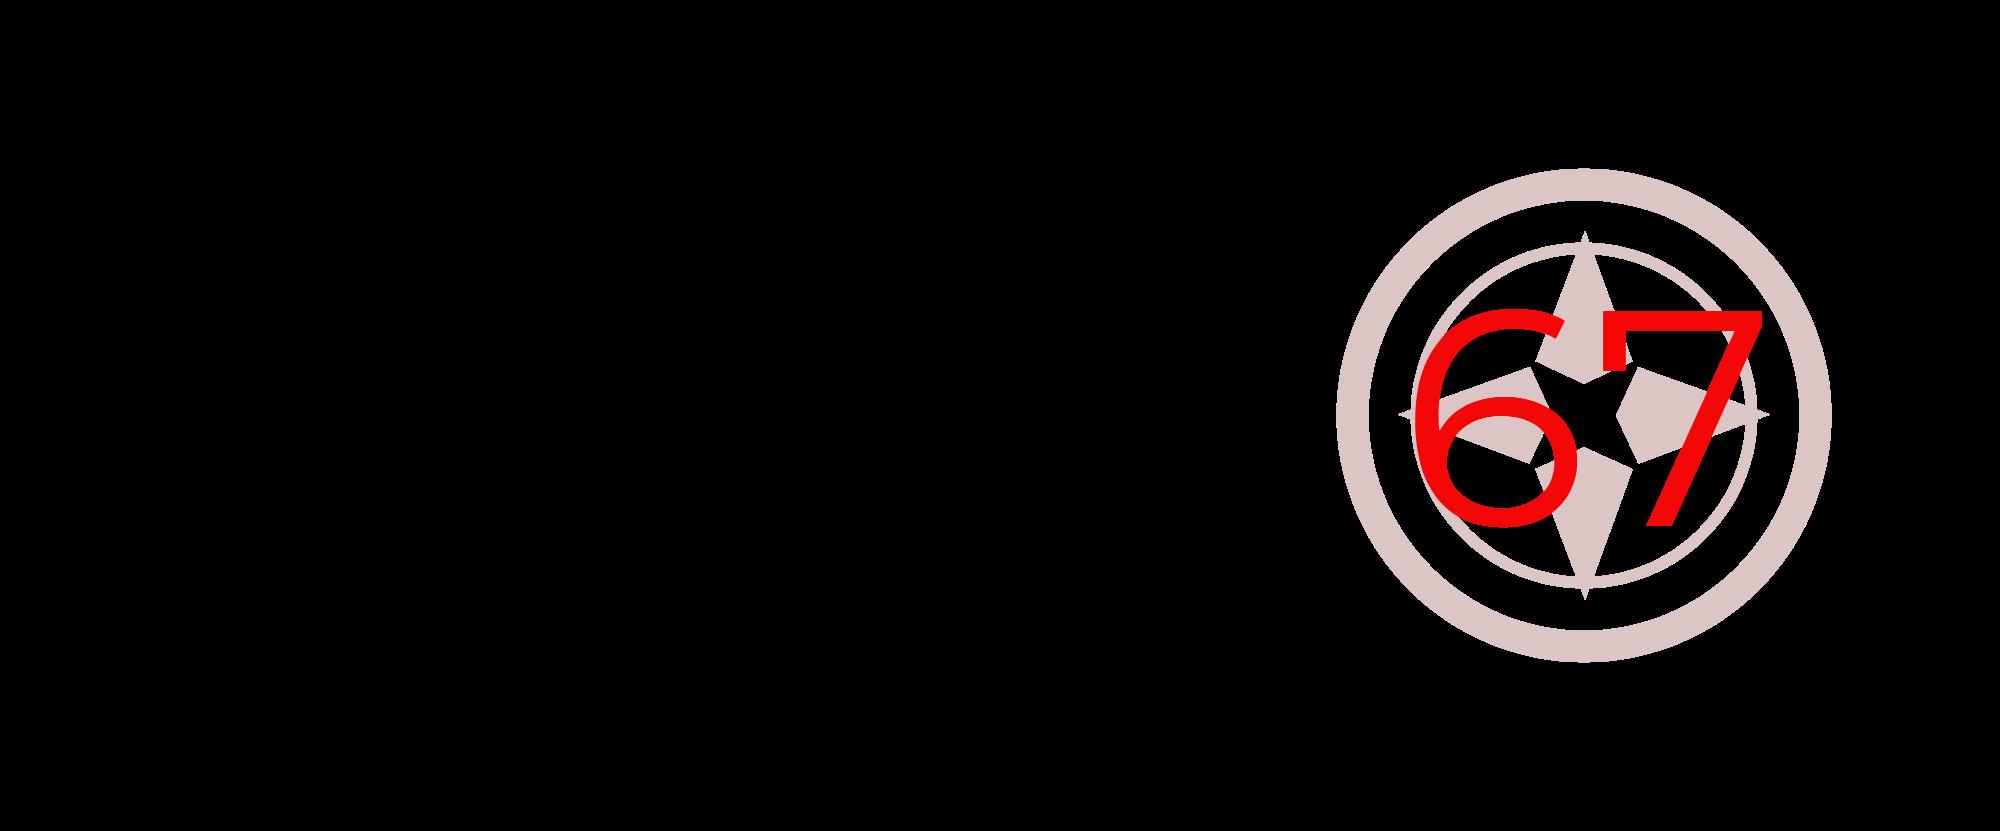 agentur-logo.png